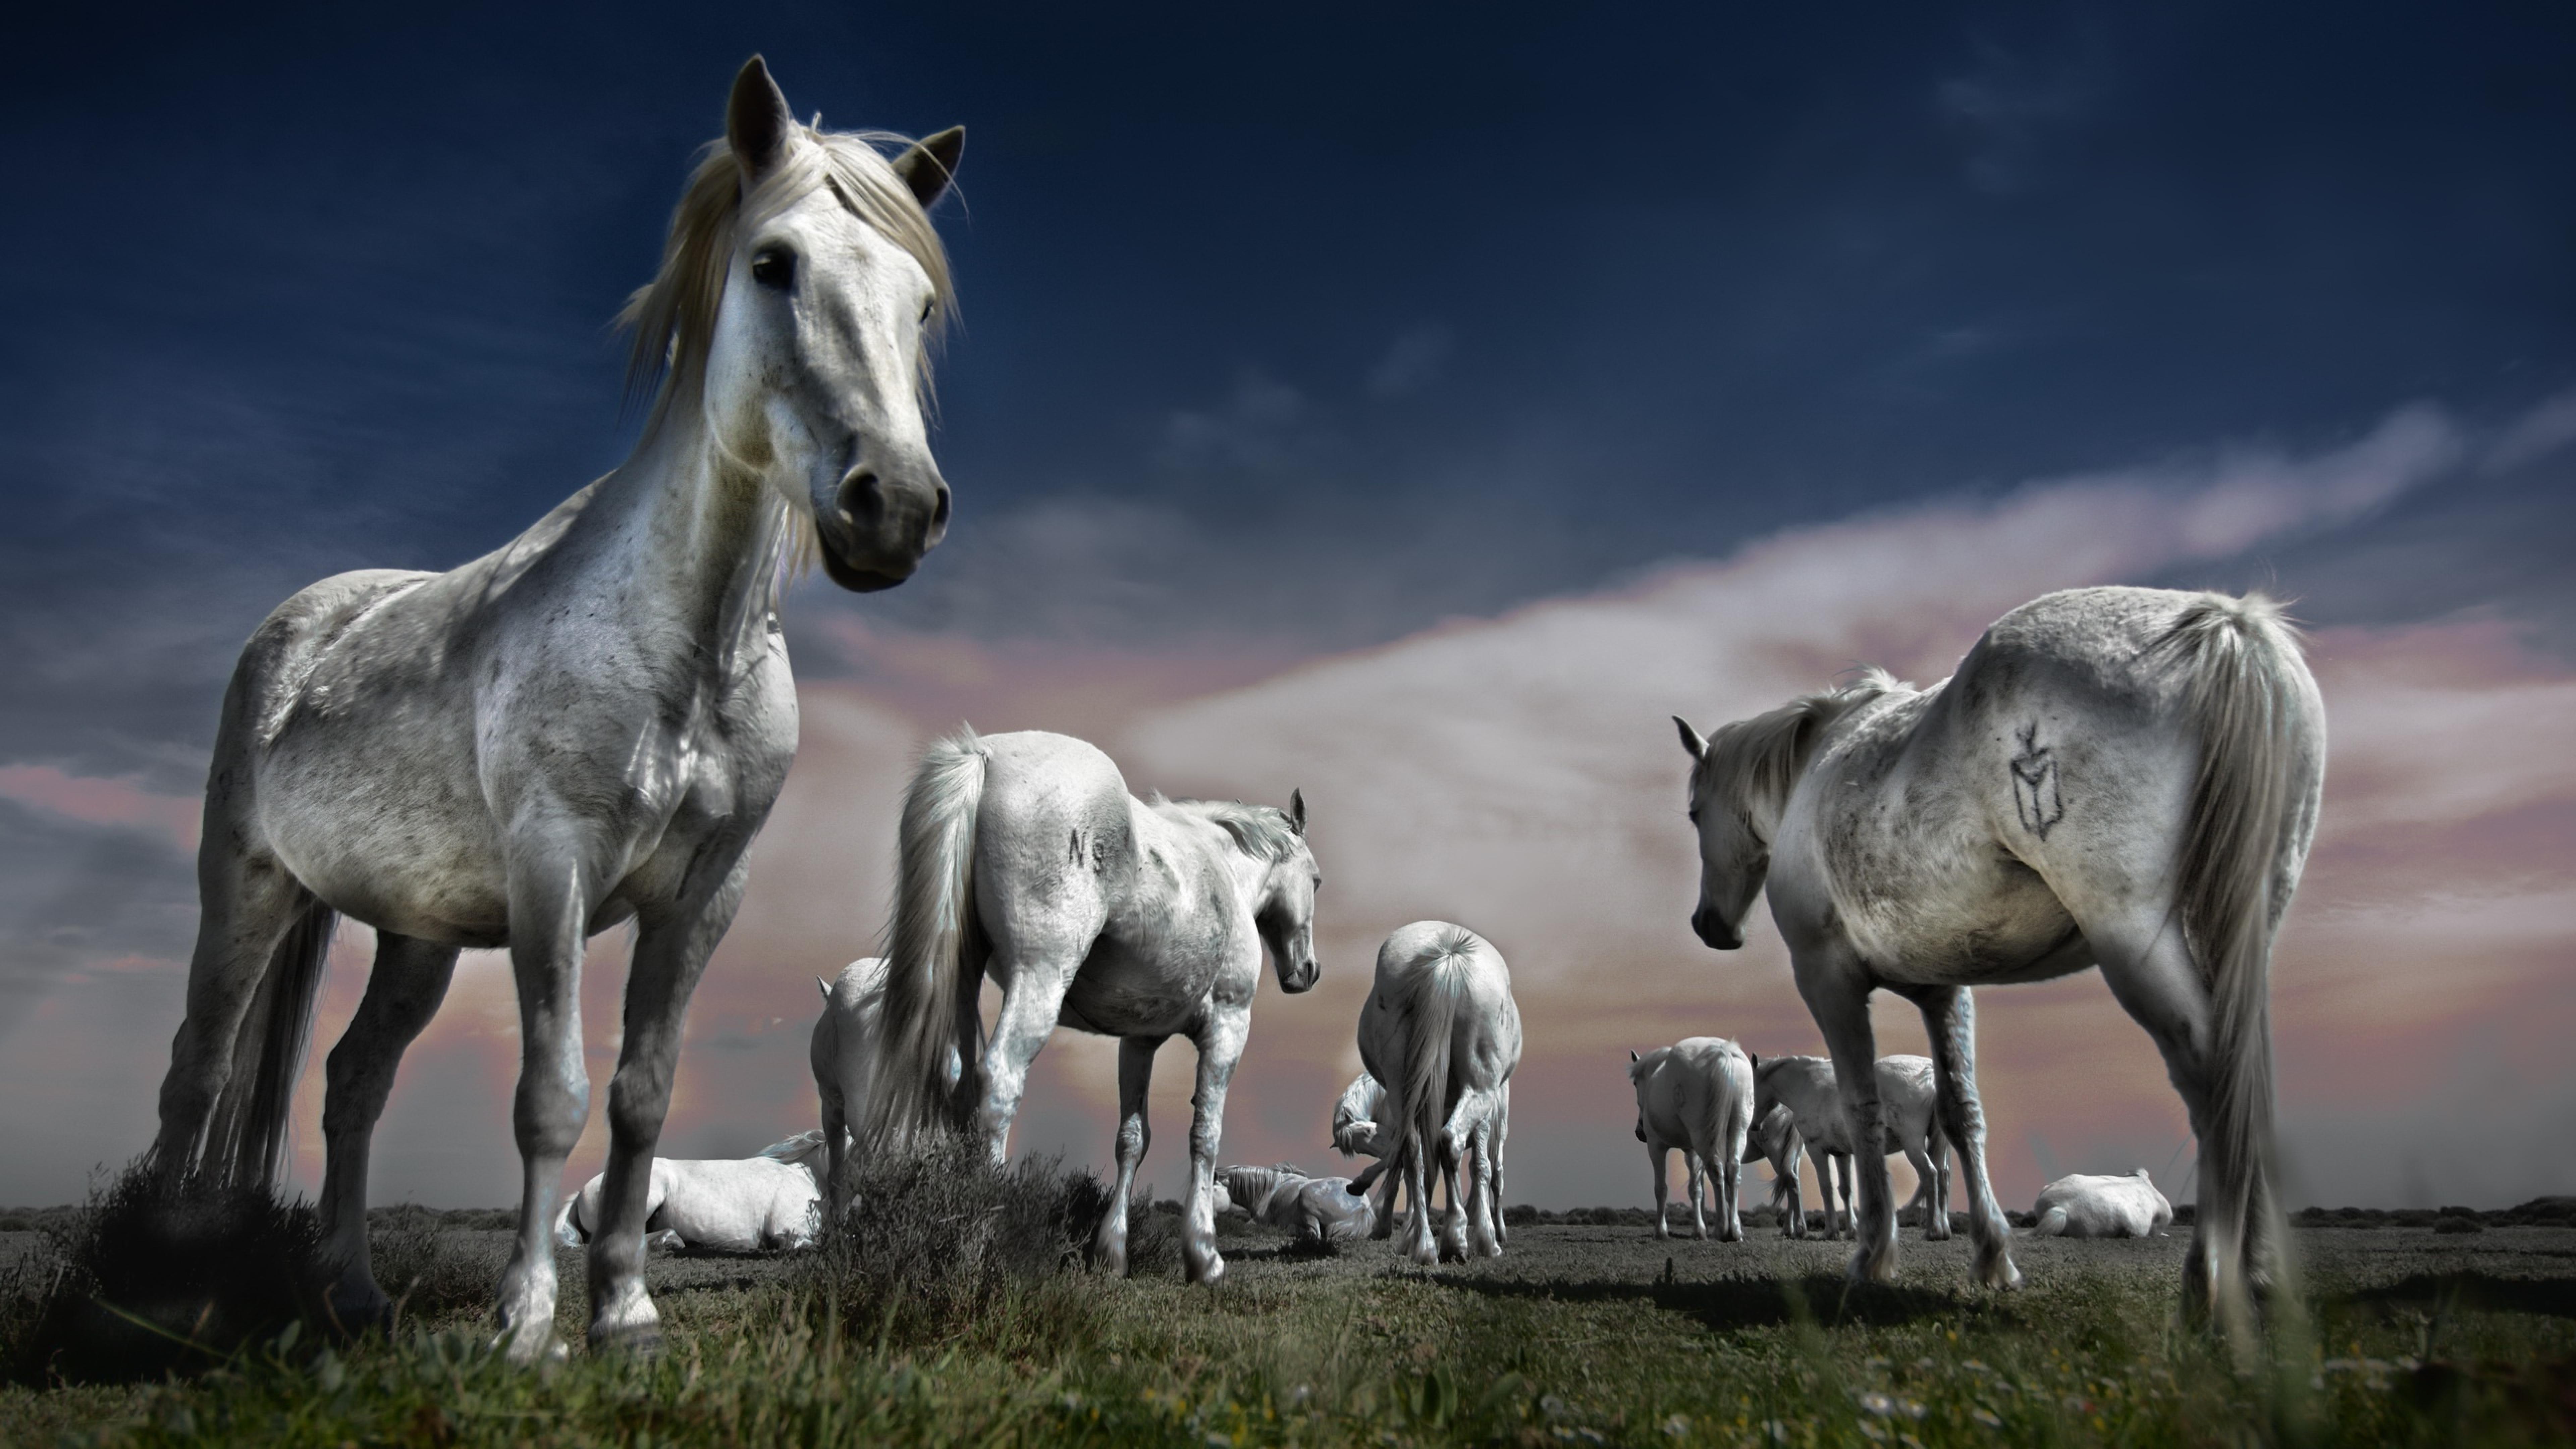 7680x4320 horse group 8k wallpaper hd animals 4k - 8k animal wallpaper ...